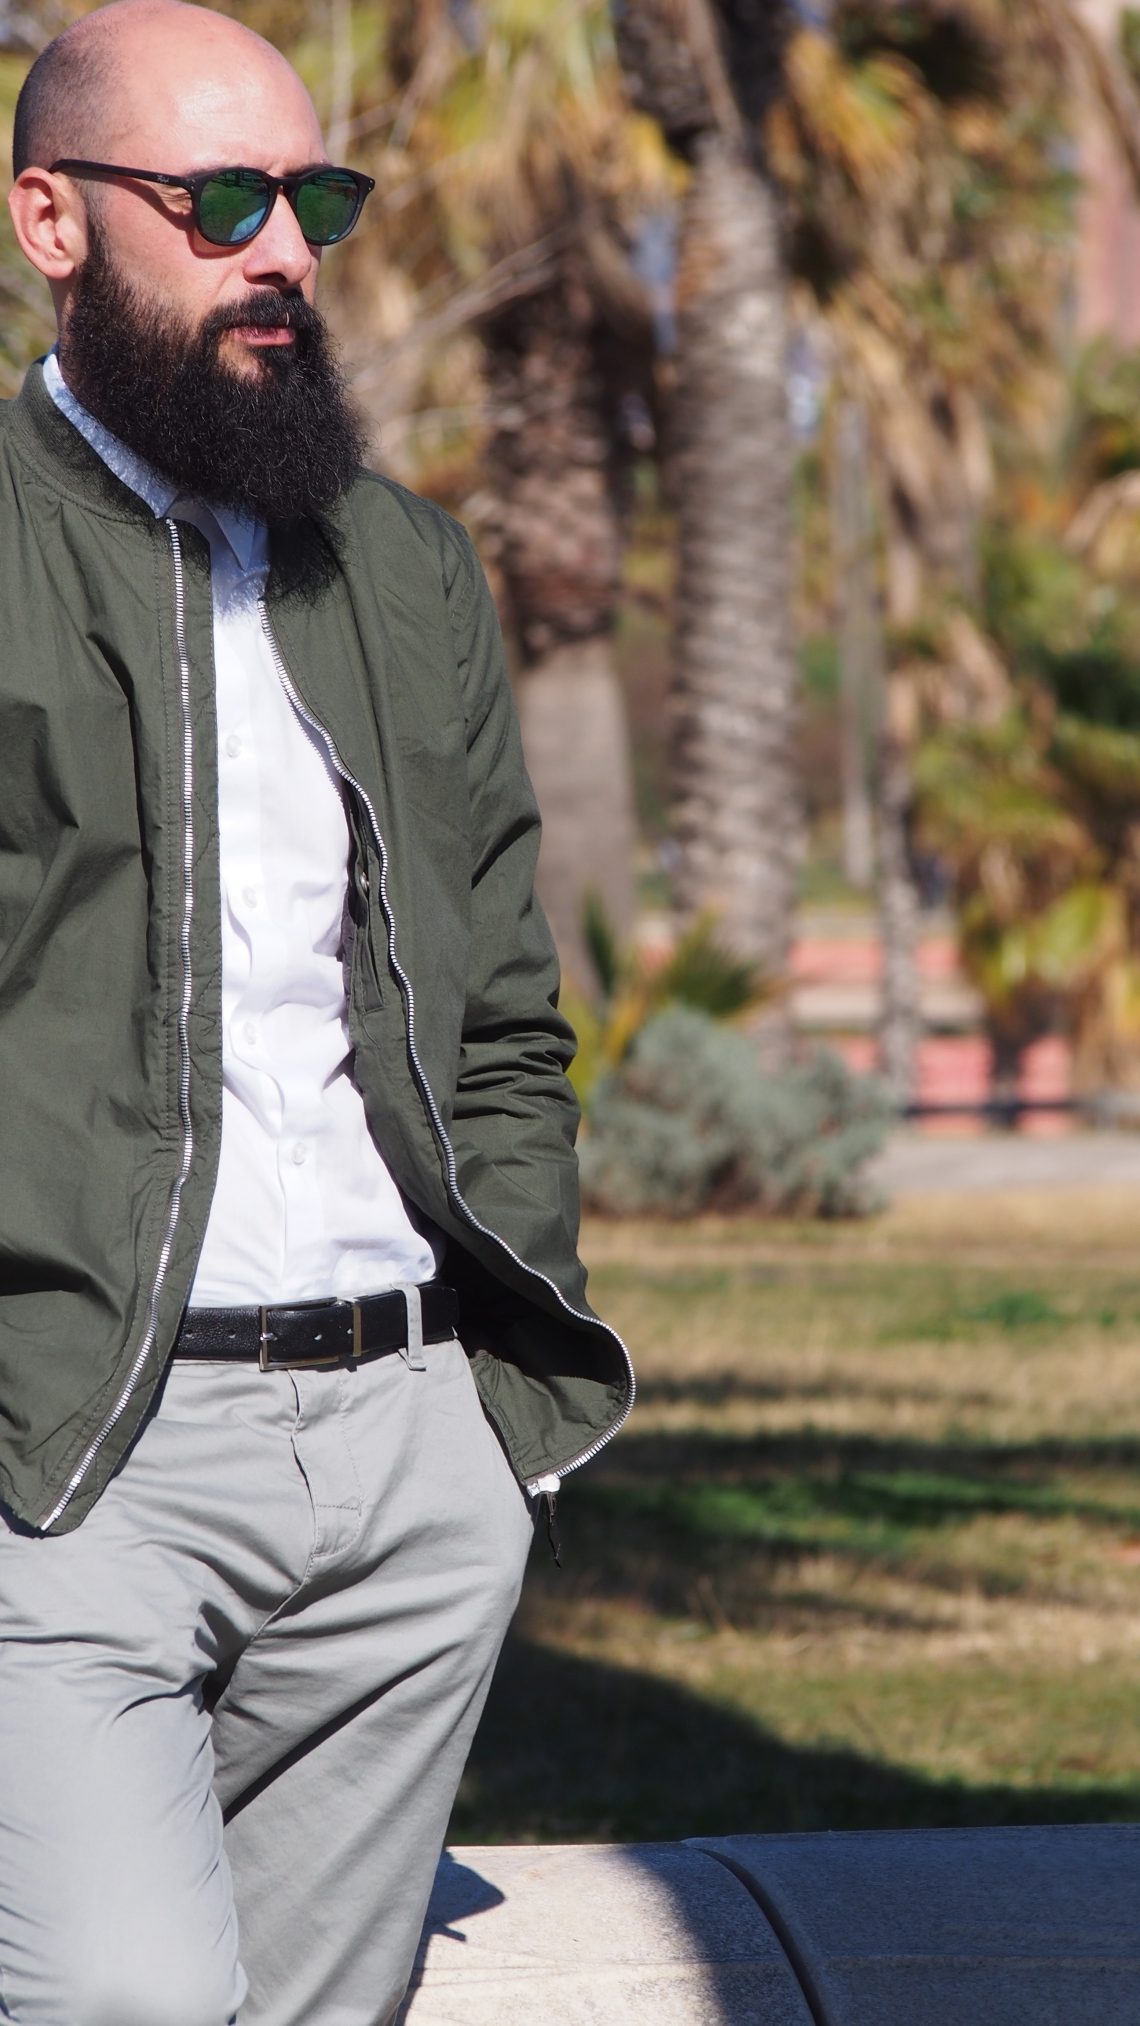 beard boy bomber chico